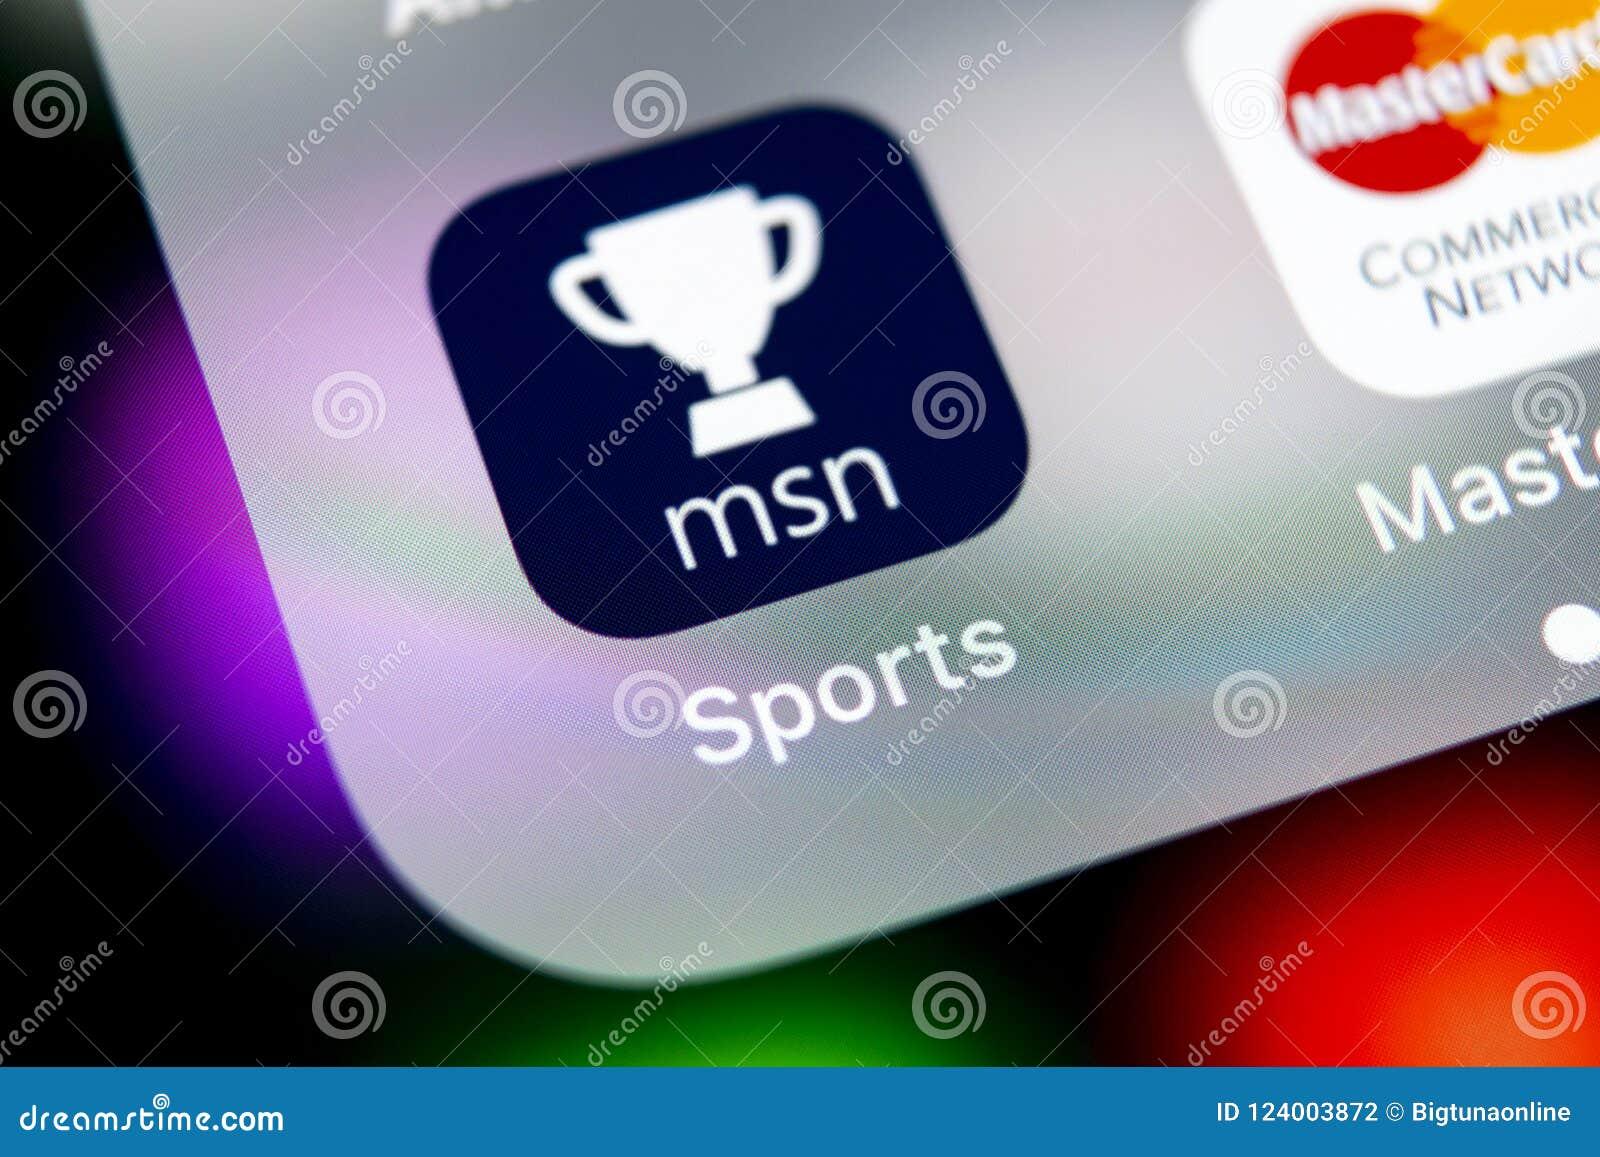 microsoft msn sports application icon on apple iphone x screen close